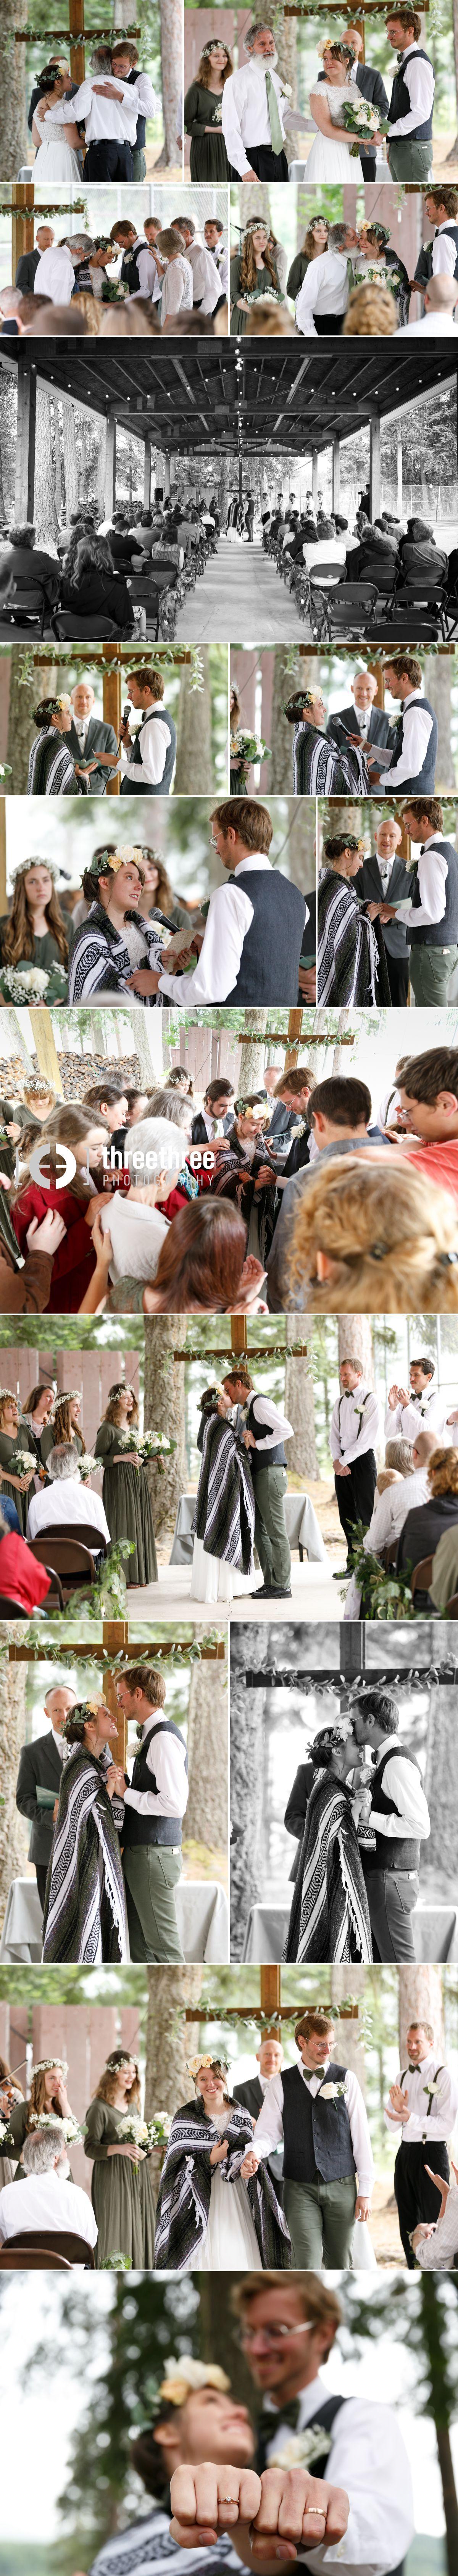 Kira Wedding Blog 8.jpg